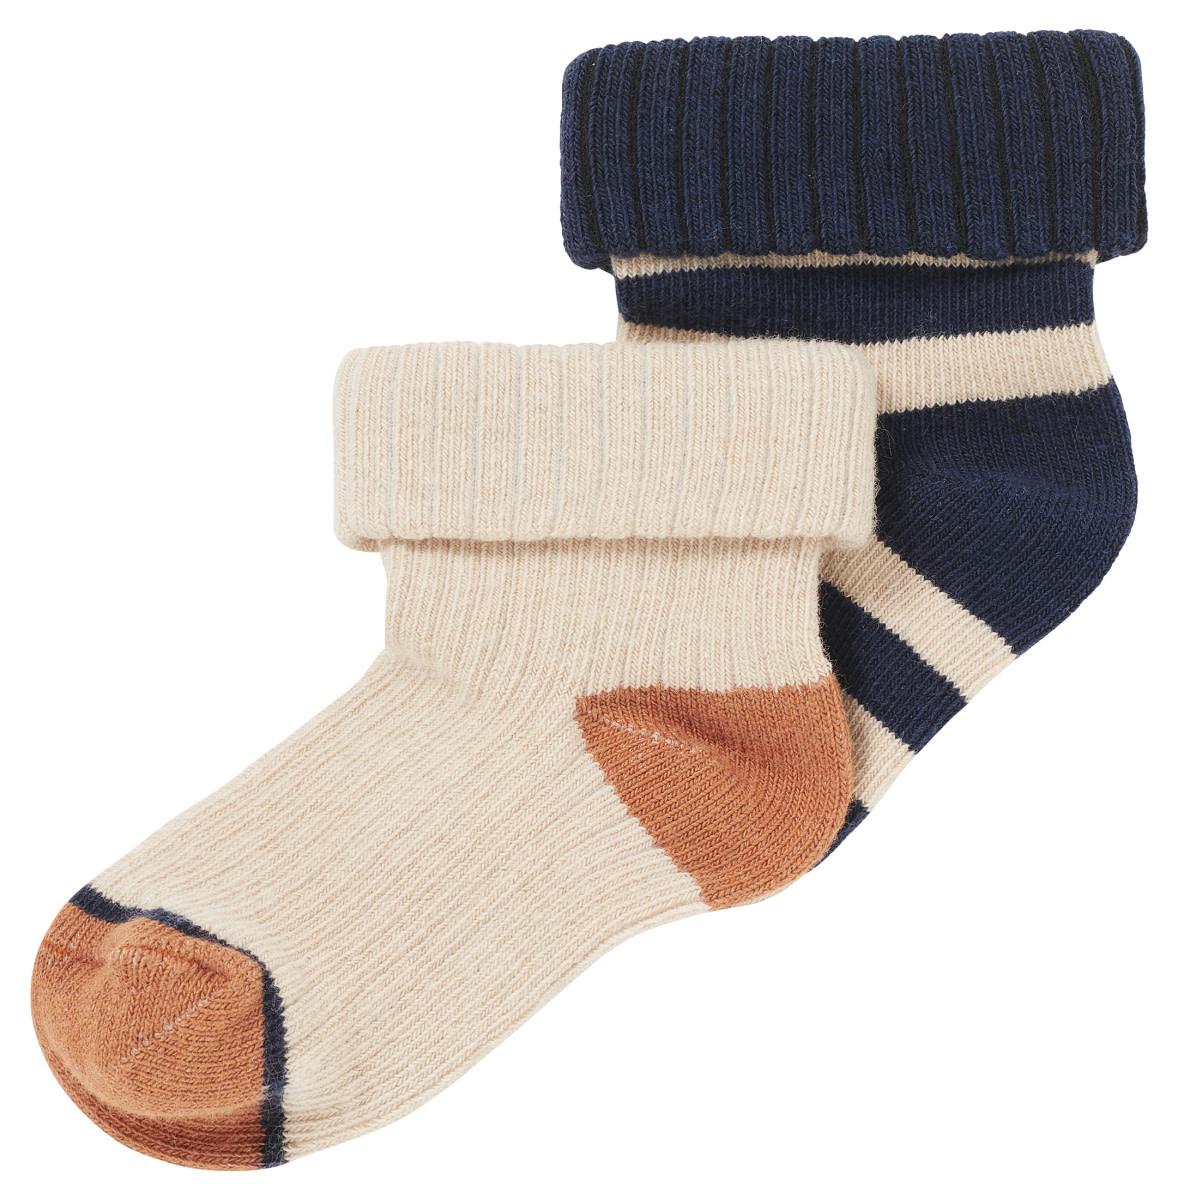 Reynosa Socks - Set of 2  Pair